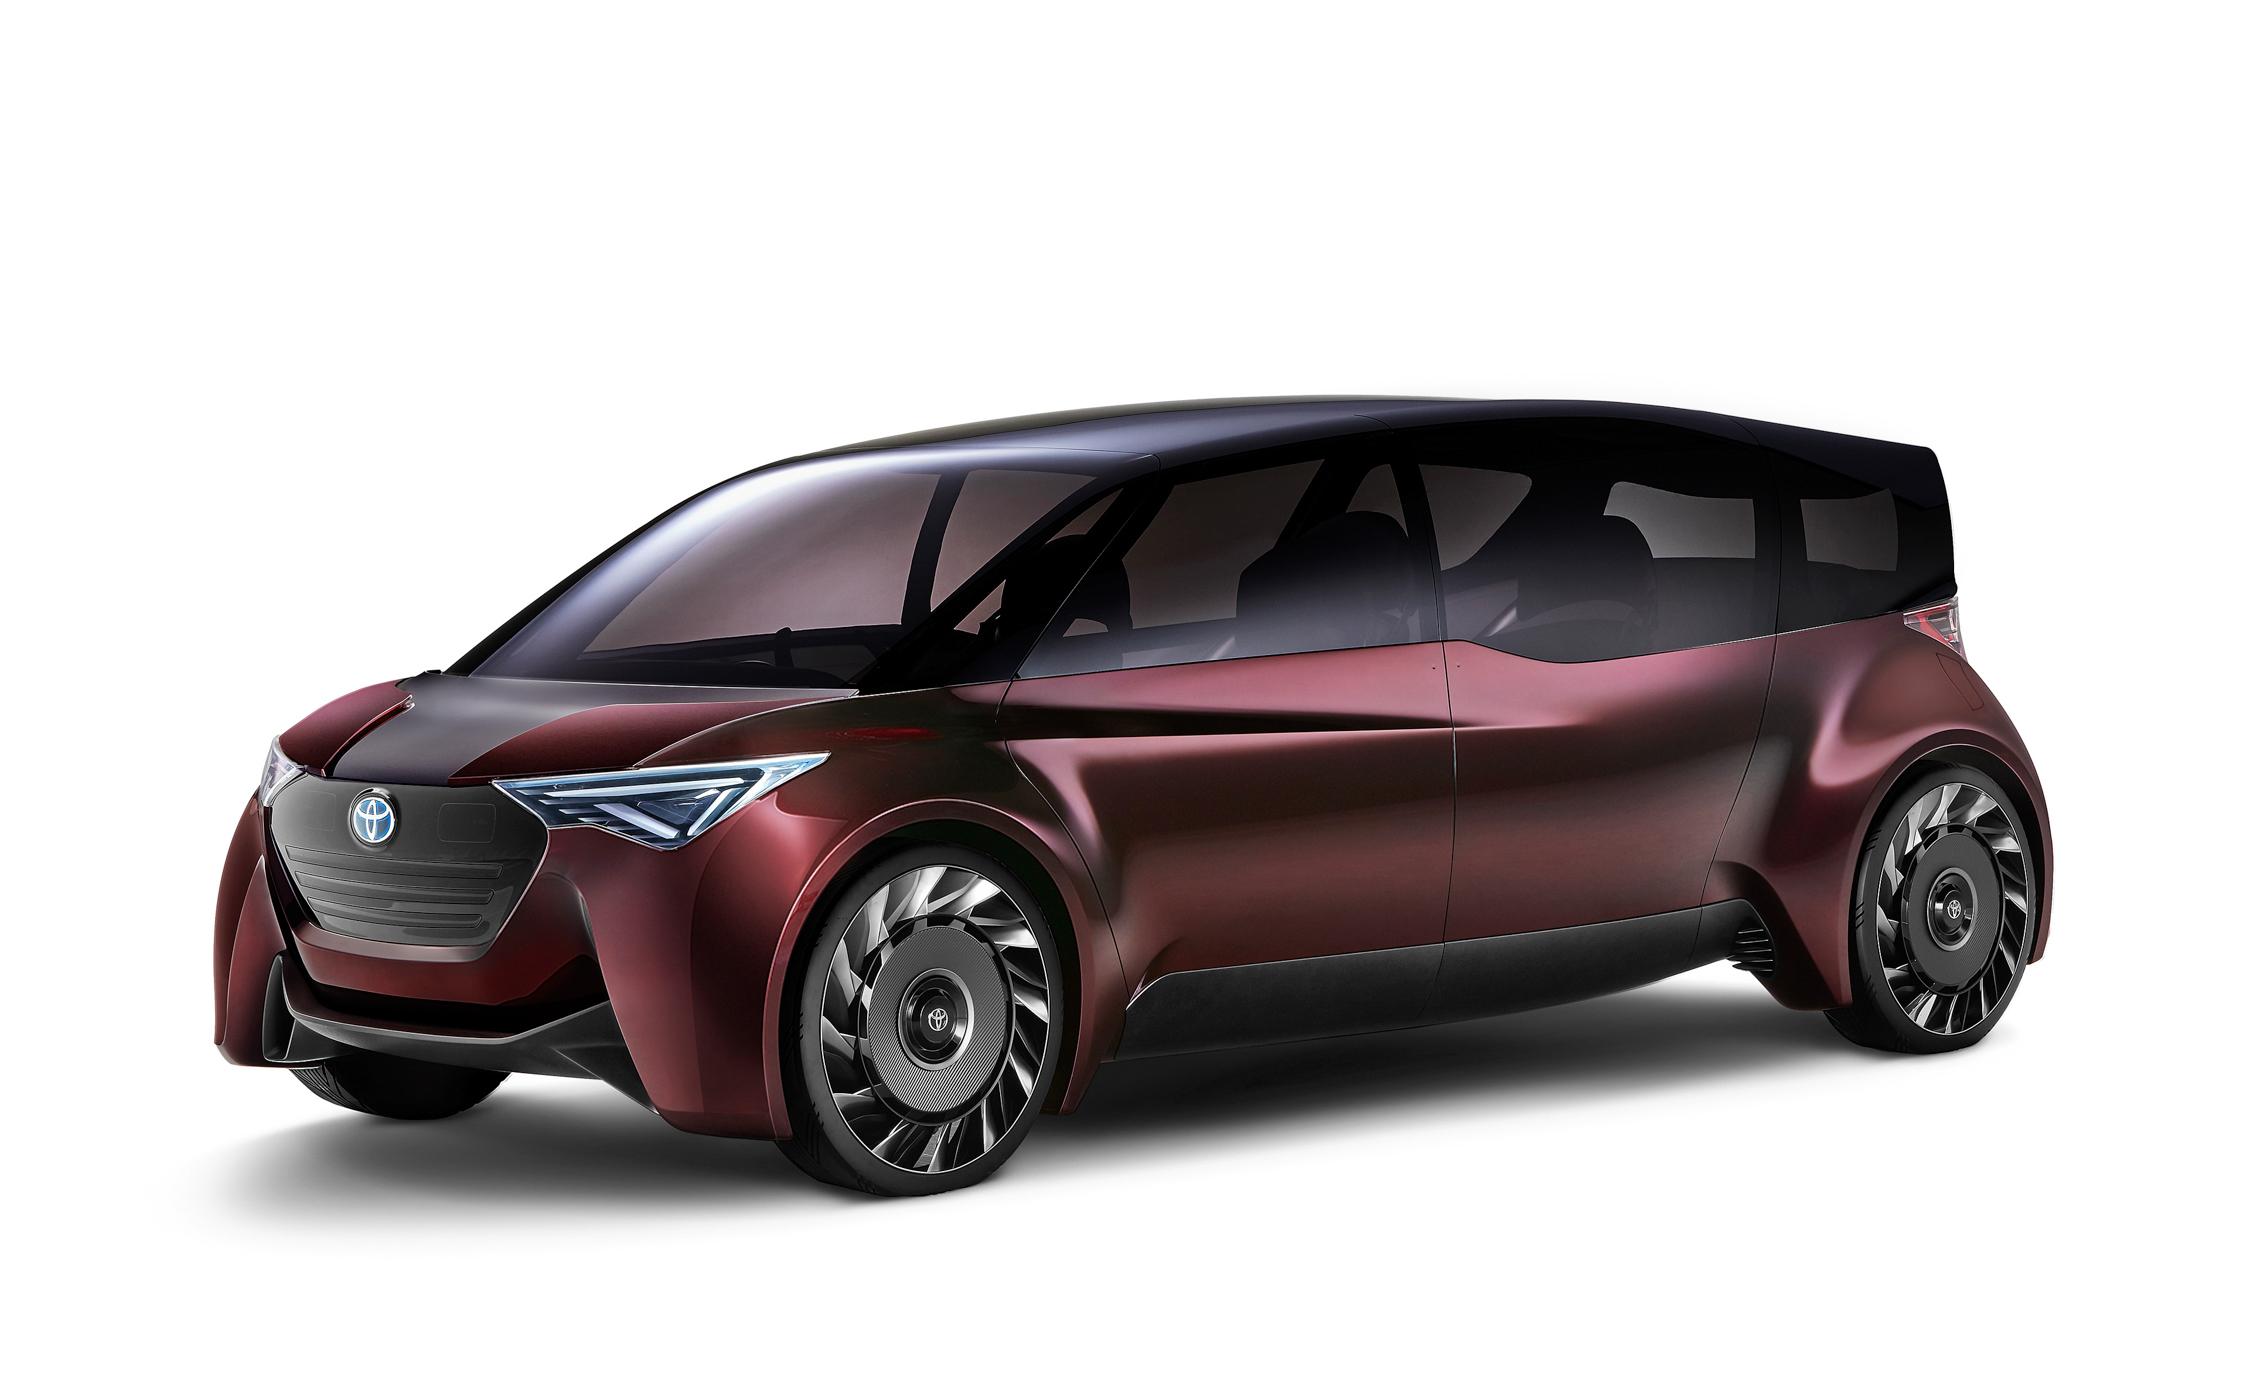 2018 Toyota Fine-Comfort Ride Concept